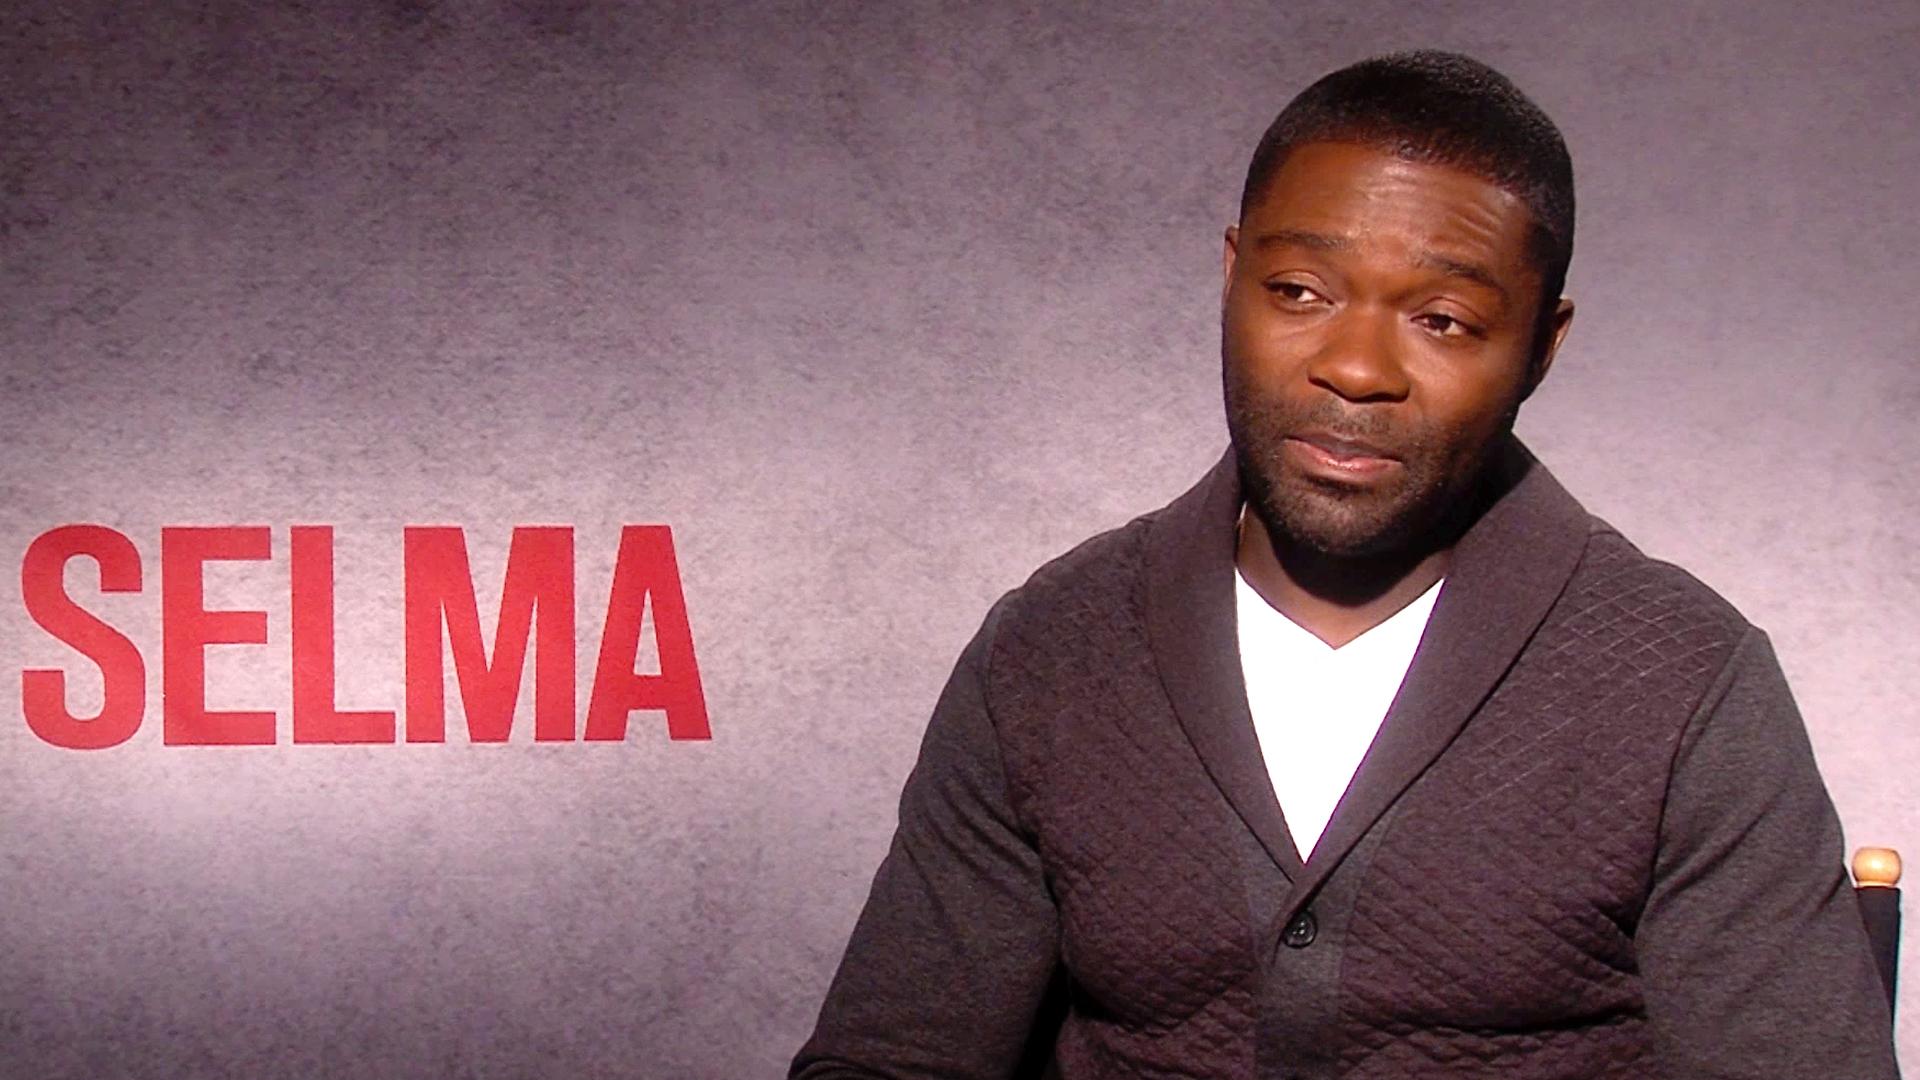 Selma: Weekend Ticket Episode 96 - David Oyelowo - Fandango